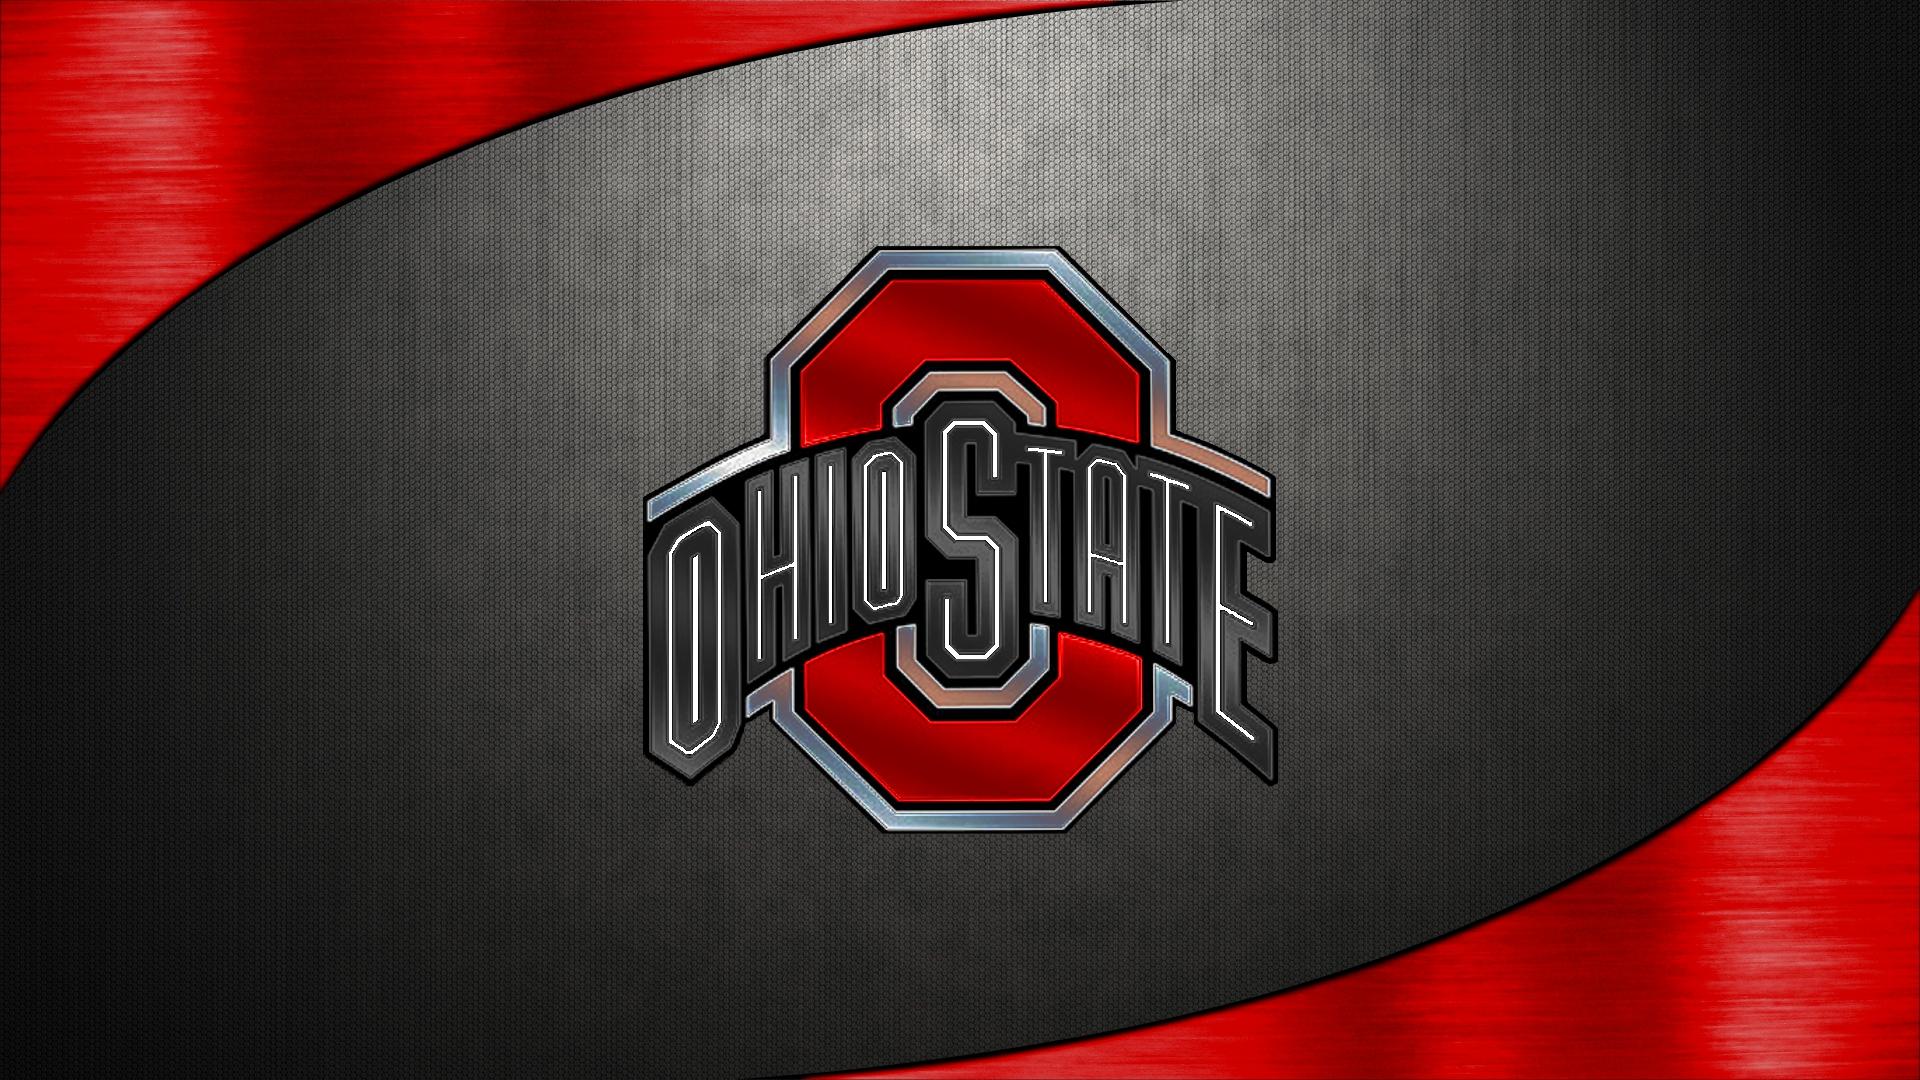 OSU Wallpaper 447 - Ohio State Football Wallpaper (33541146) - Fanpop